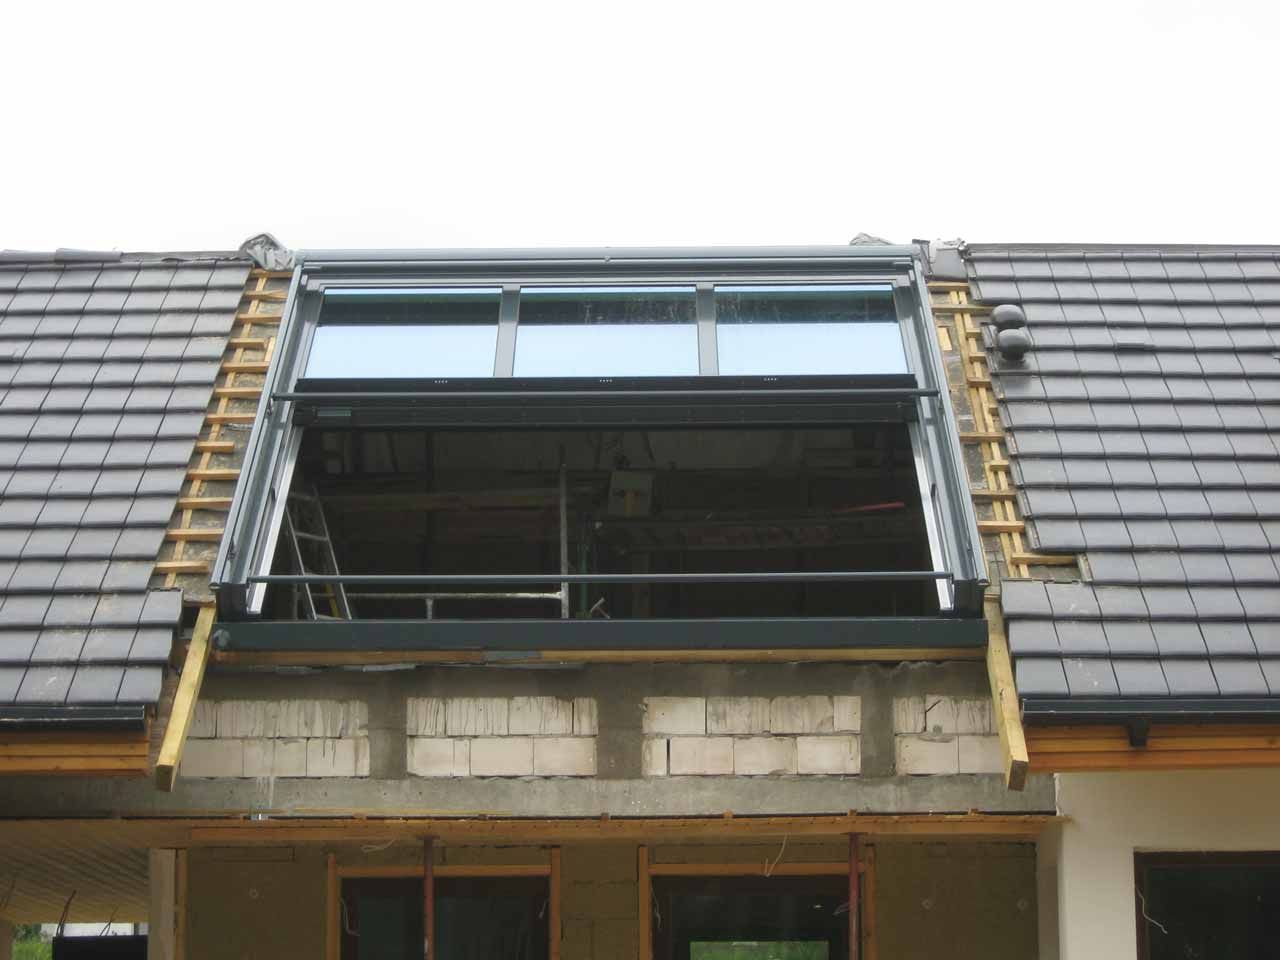 openair dachfenster ideen zu dachwintergarten. Black Bedroom Furniture Sets. Home Design Ideas